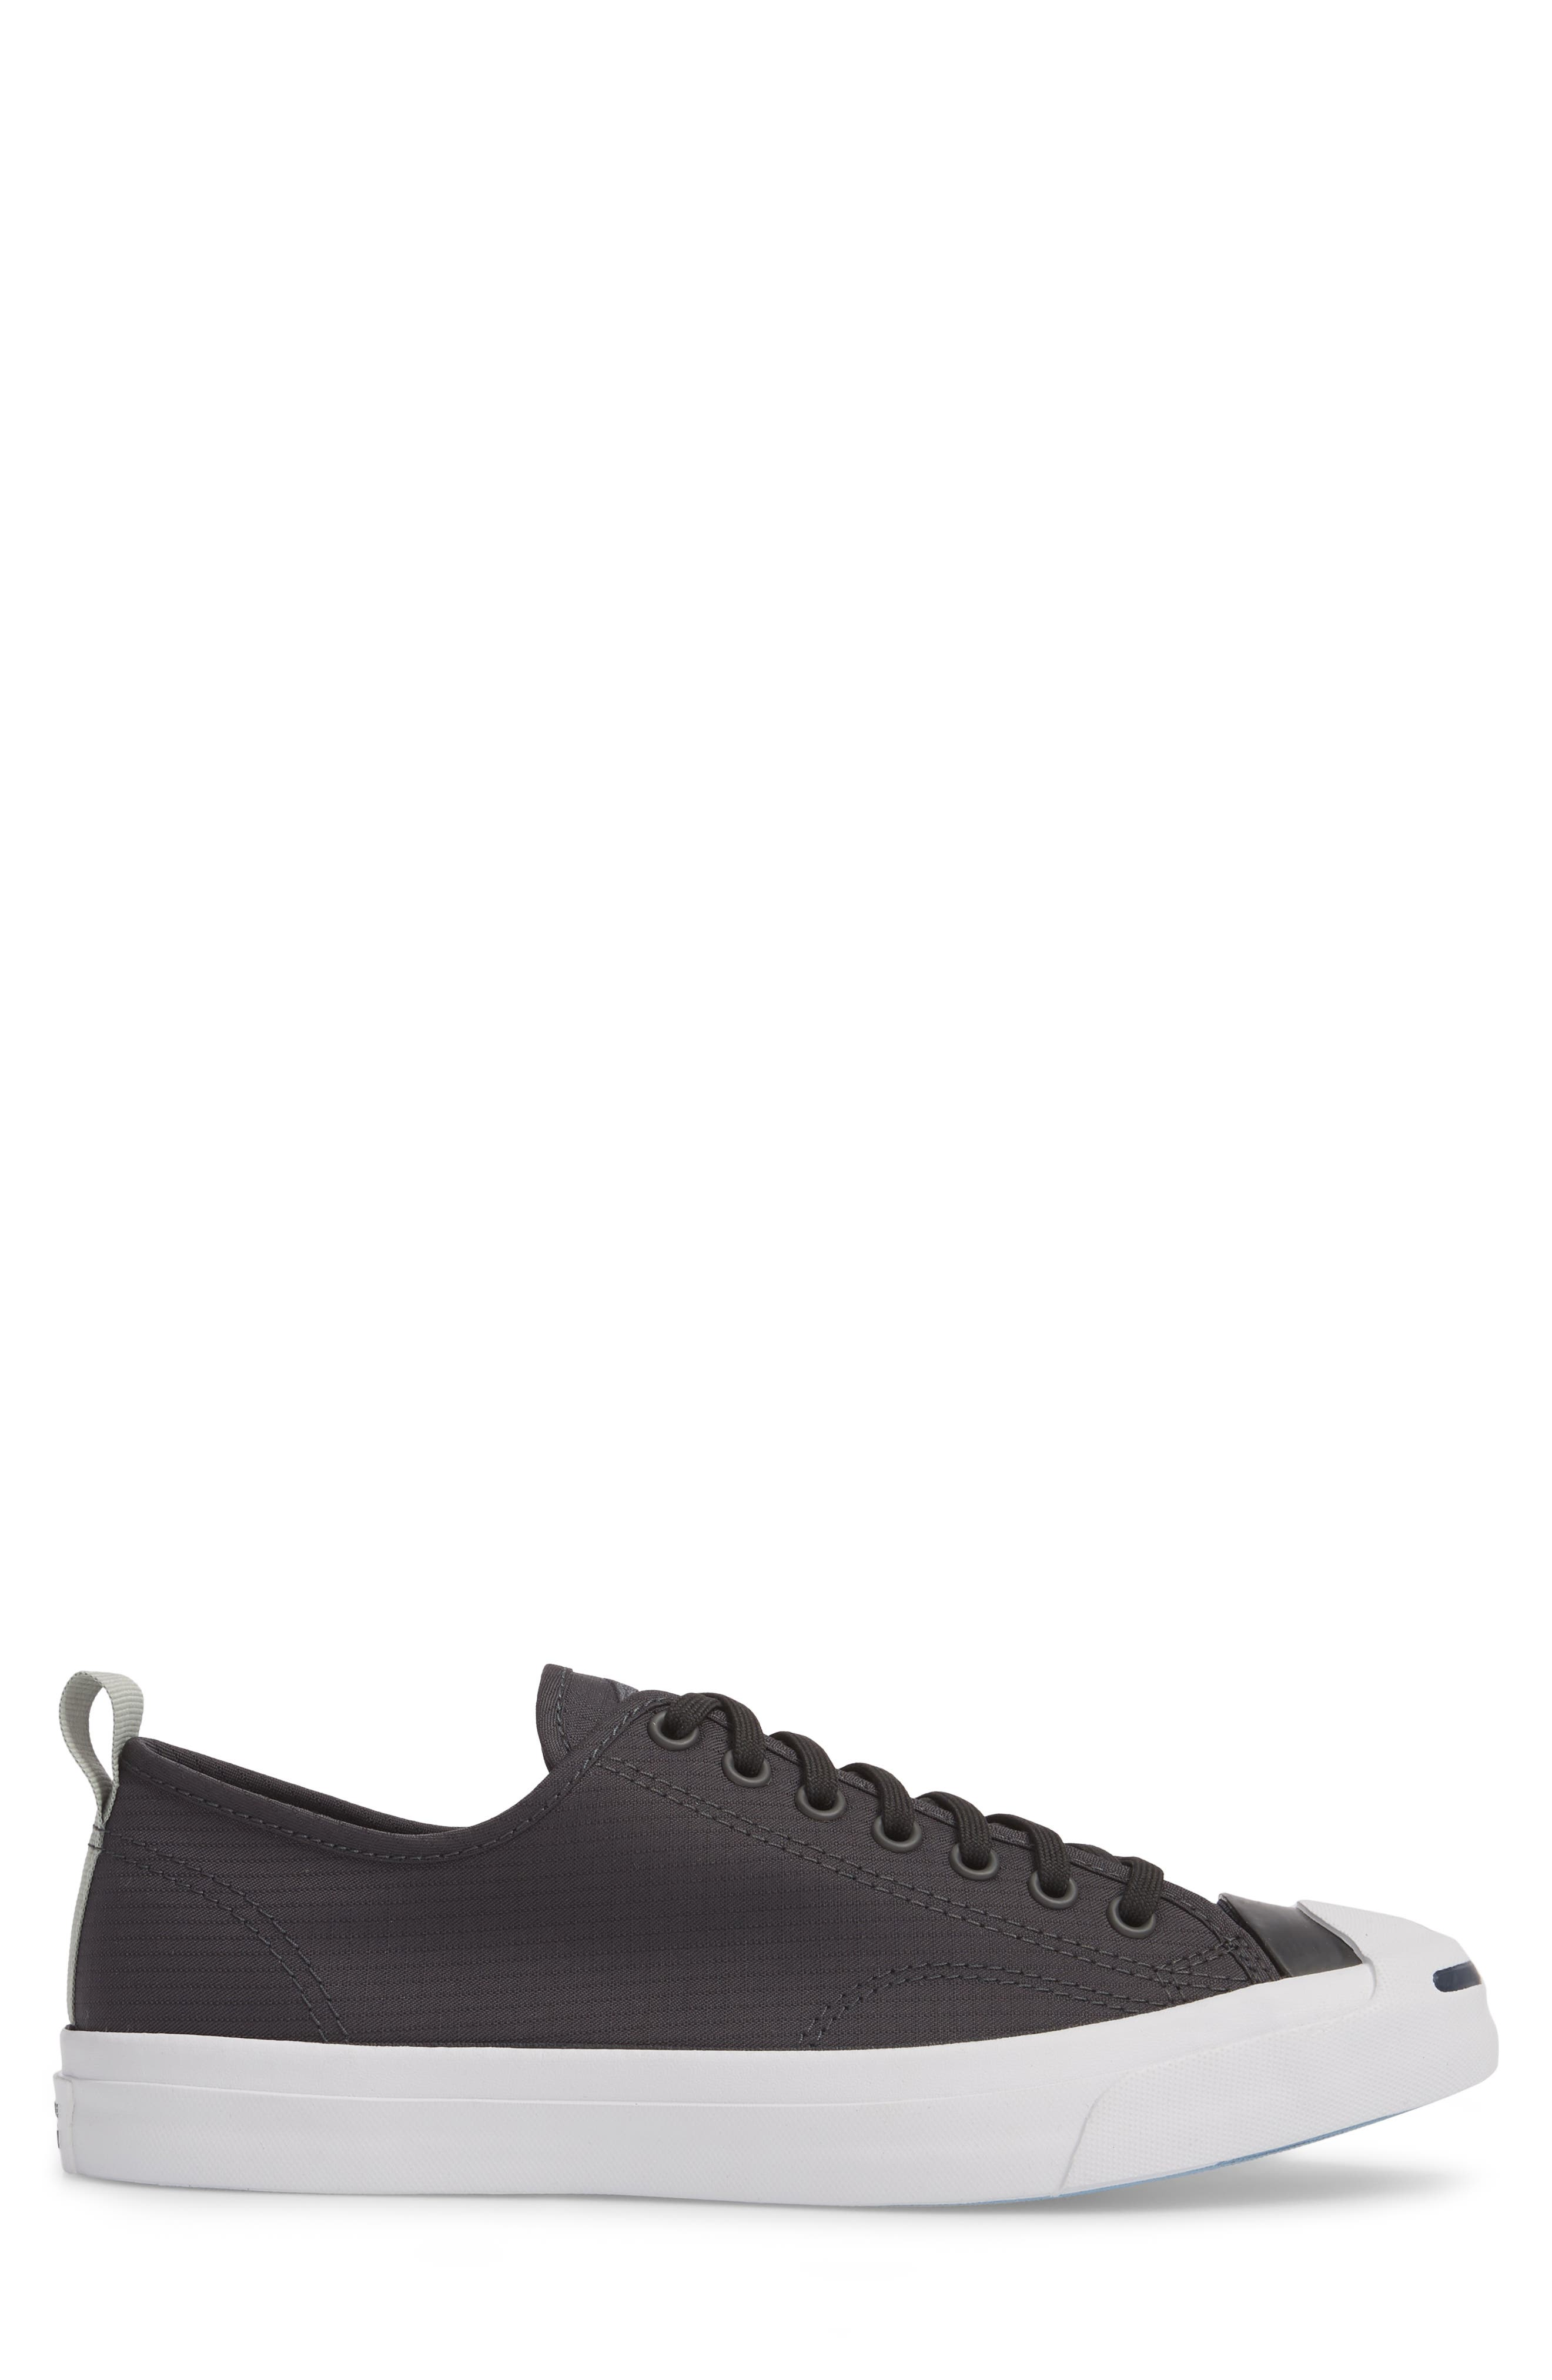 Jack Purcell Ripstop Sneaker,                             Alternate thumbnail 3, color,                             Black